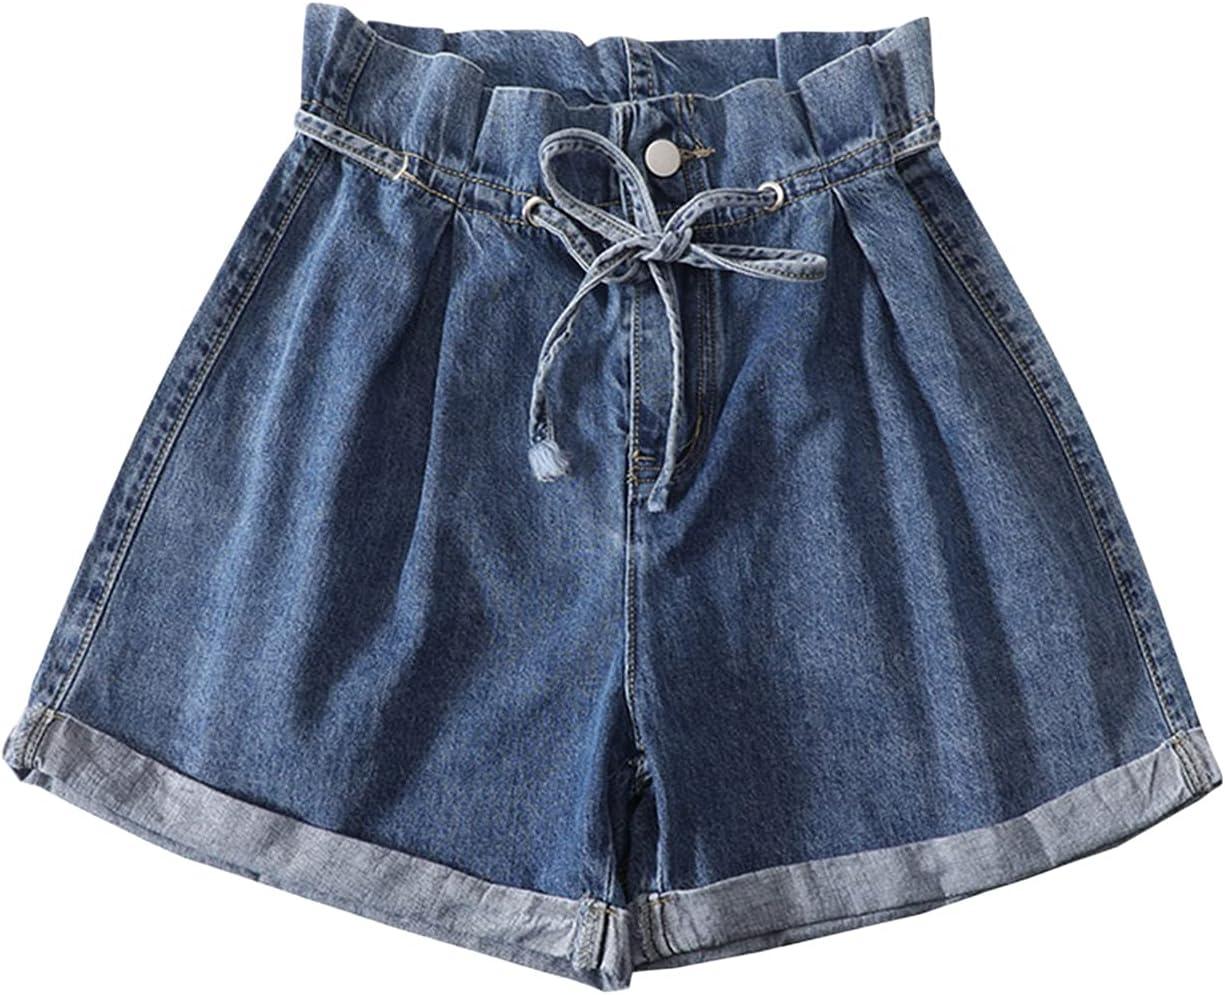 Women Cuffed Drawstring Denim Shorts High Waisted Elastic Waist Jean Shorts Soft Comfy Paper Bag Folded Short Jeans (Navy Blue,X-Large)